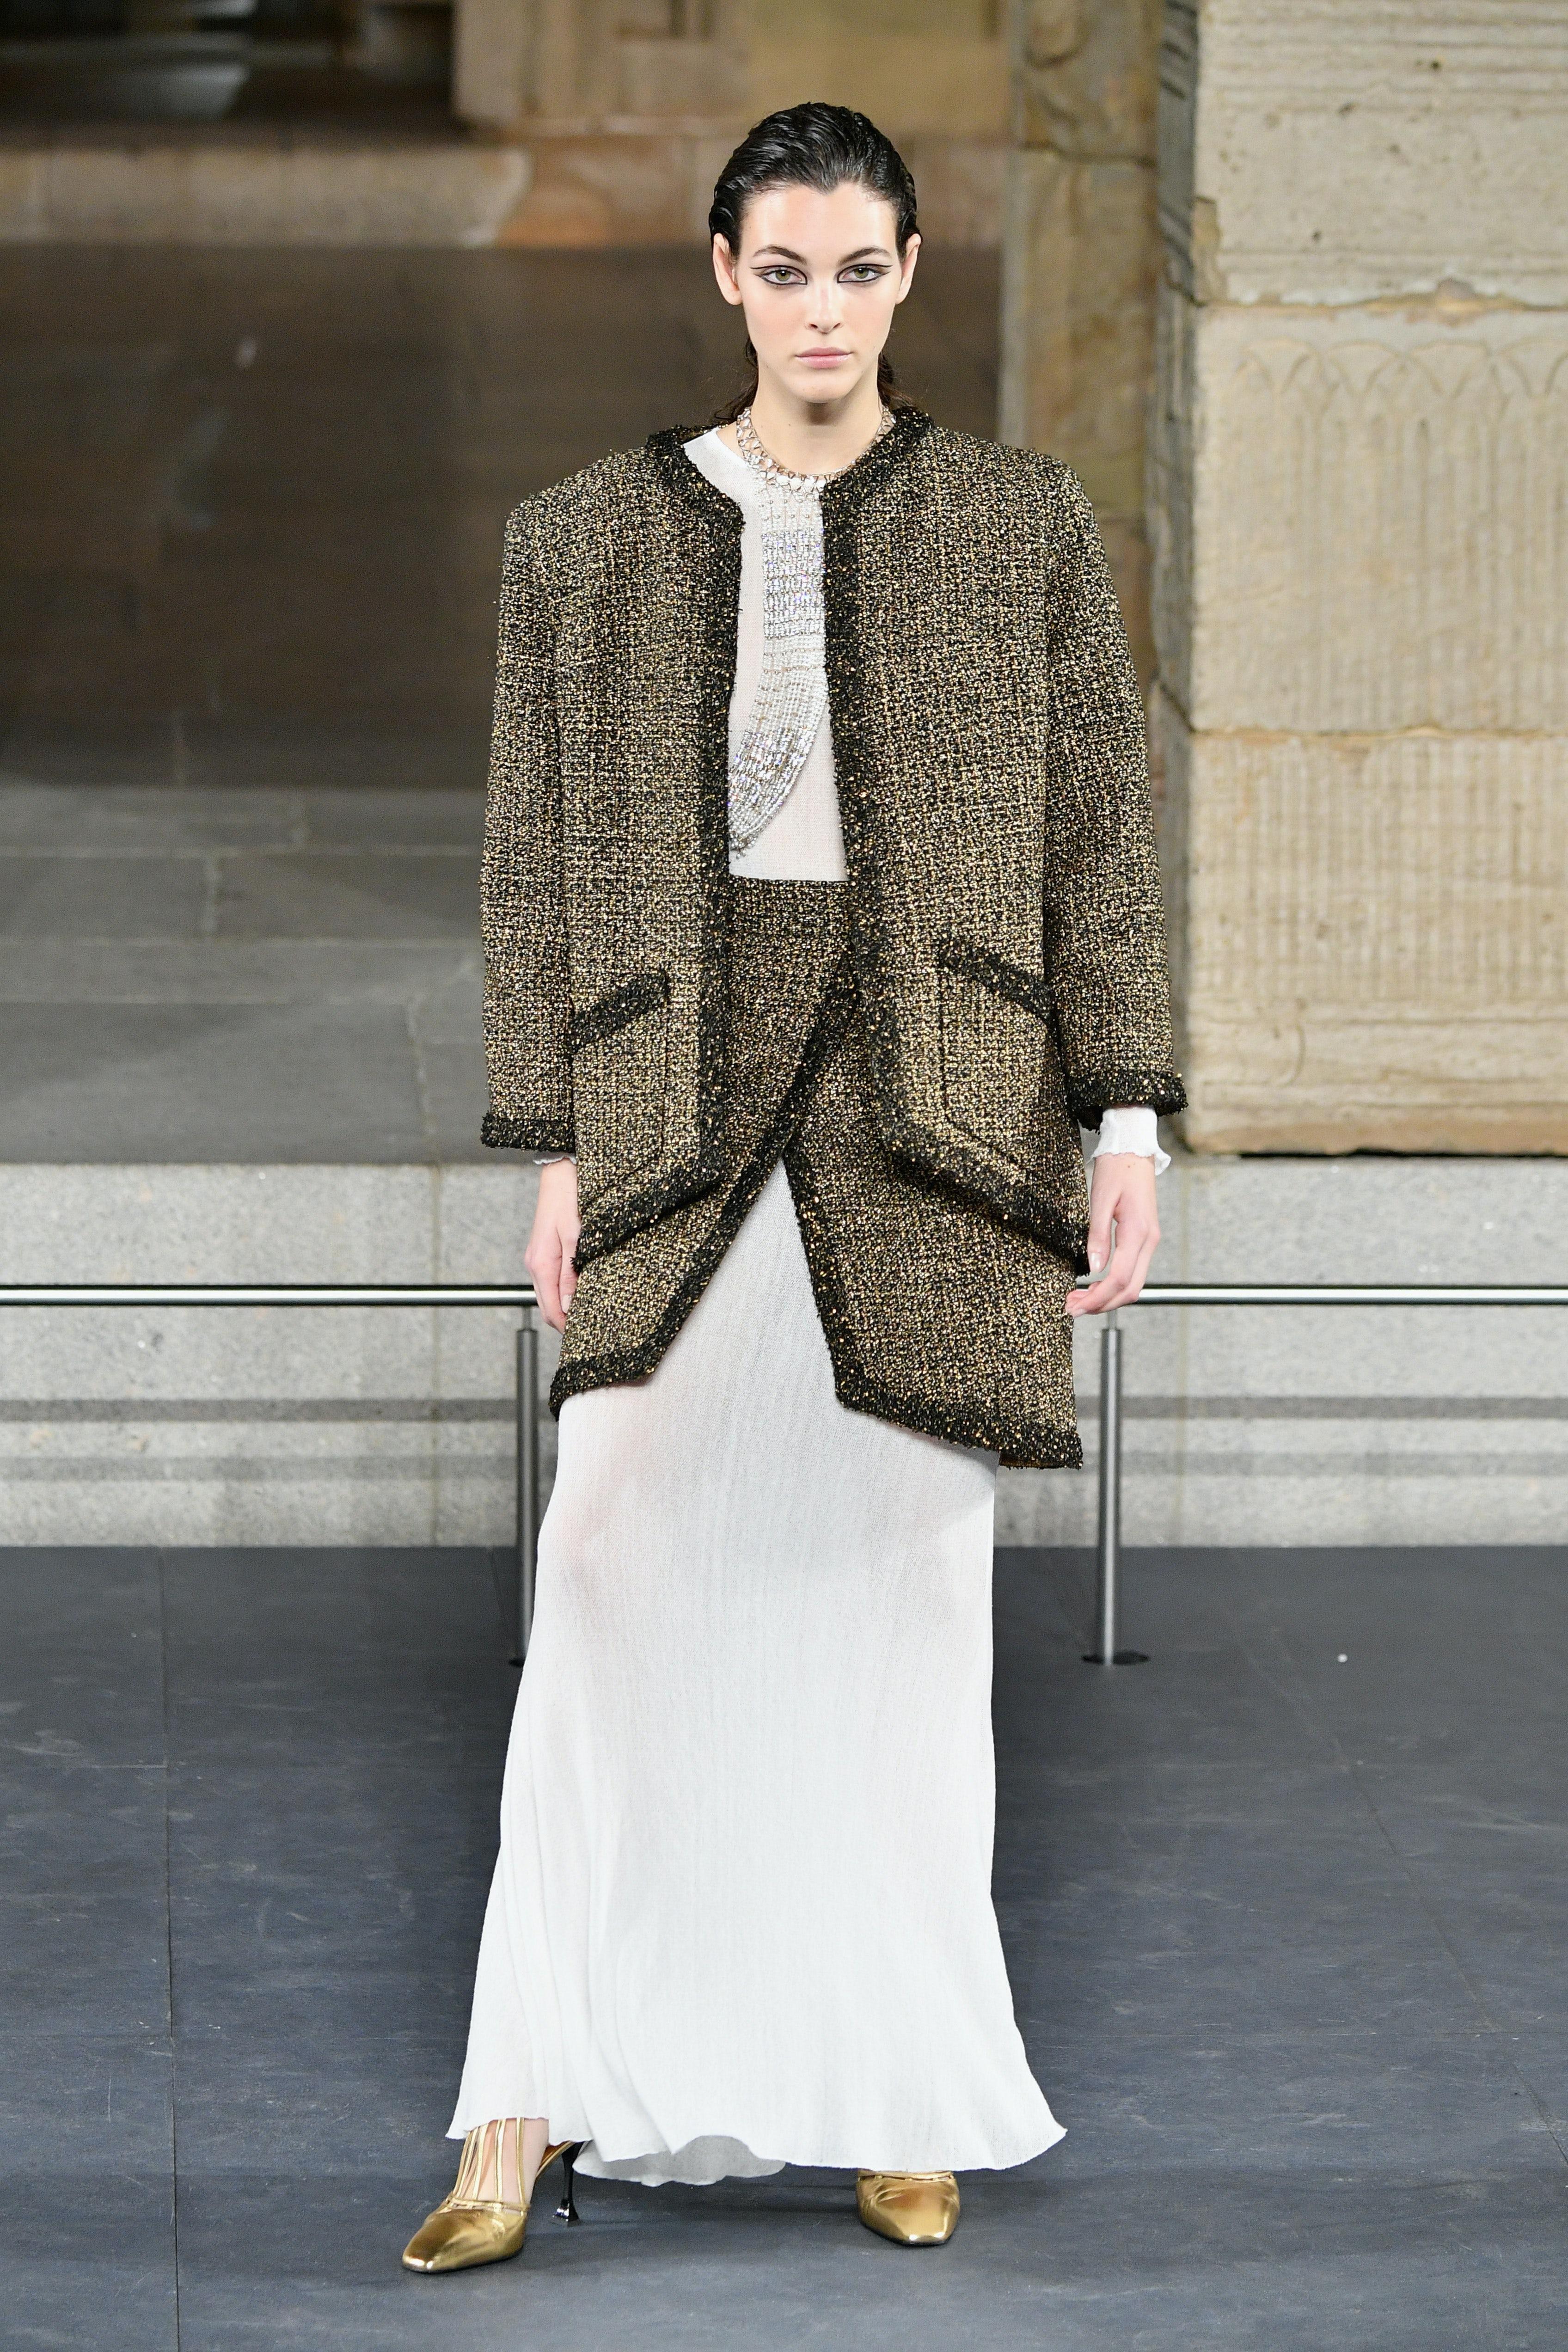 Chanel Métiers d'Arts 2019 | Source: Getty Images